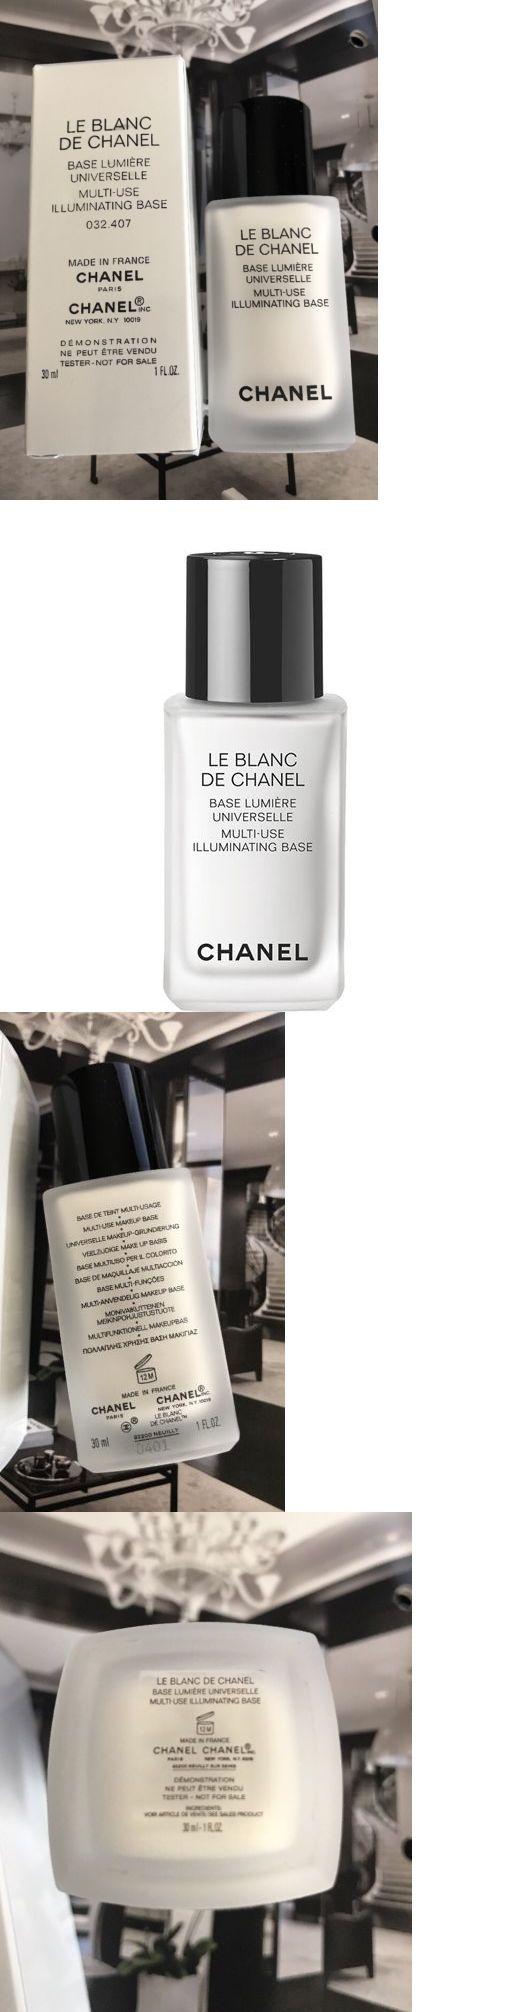 Foundation Primer: Chanel Le Blanc De Chanel Multi-Use Illuminating Base Primer New Full Size -> BUY IT NOW ONLY: $38 on eBay!